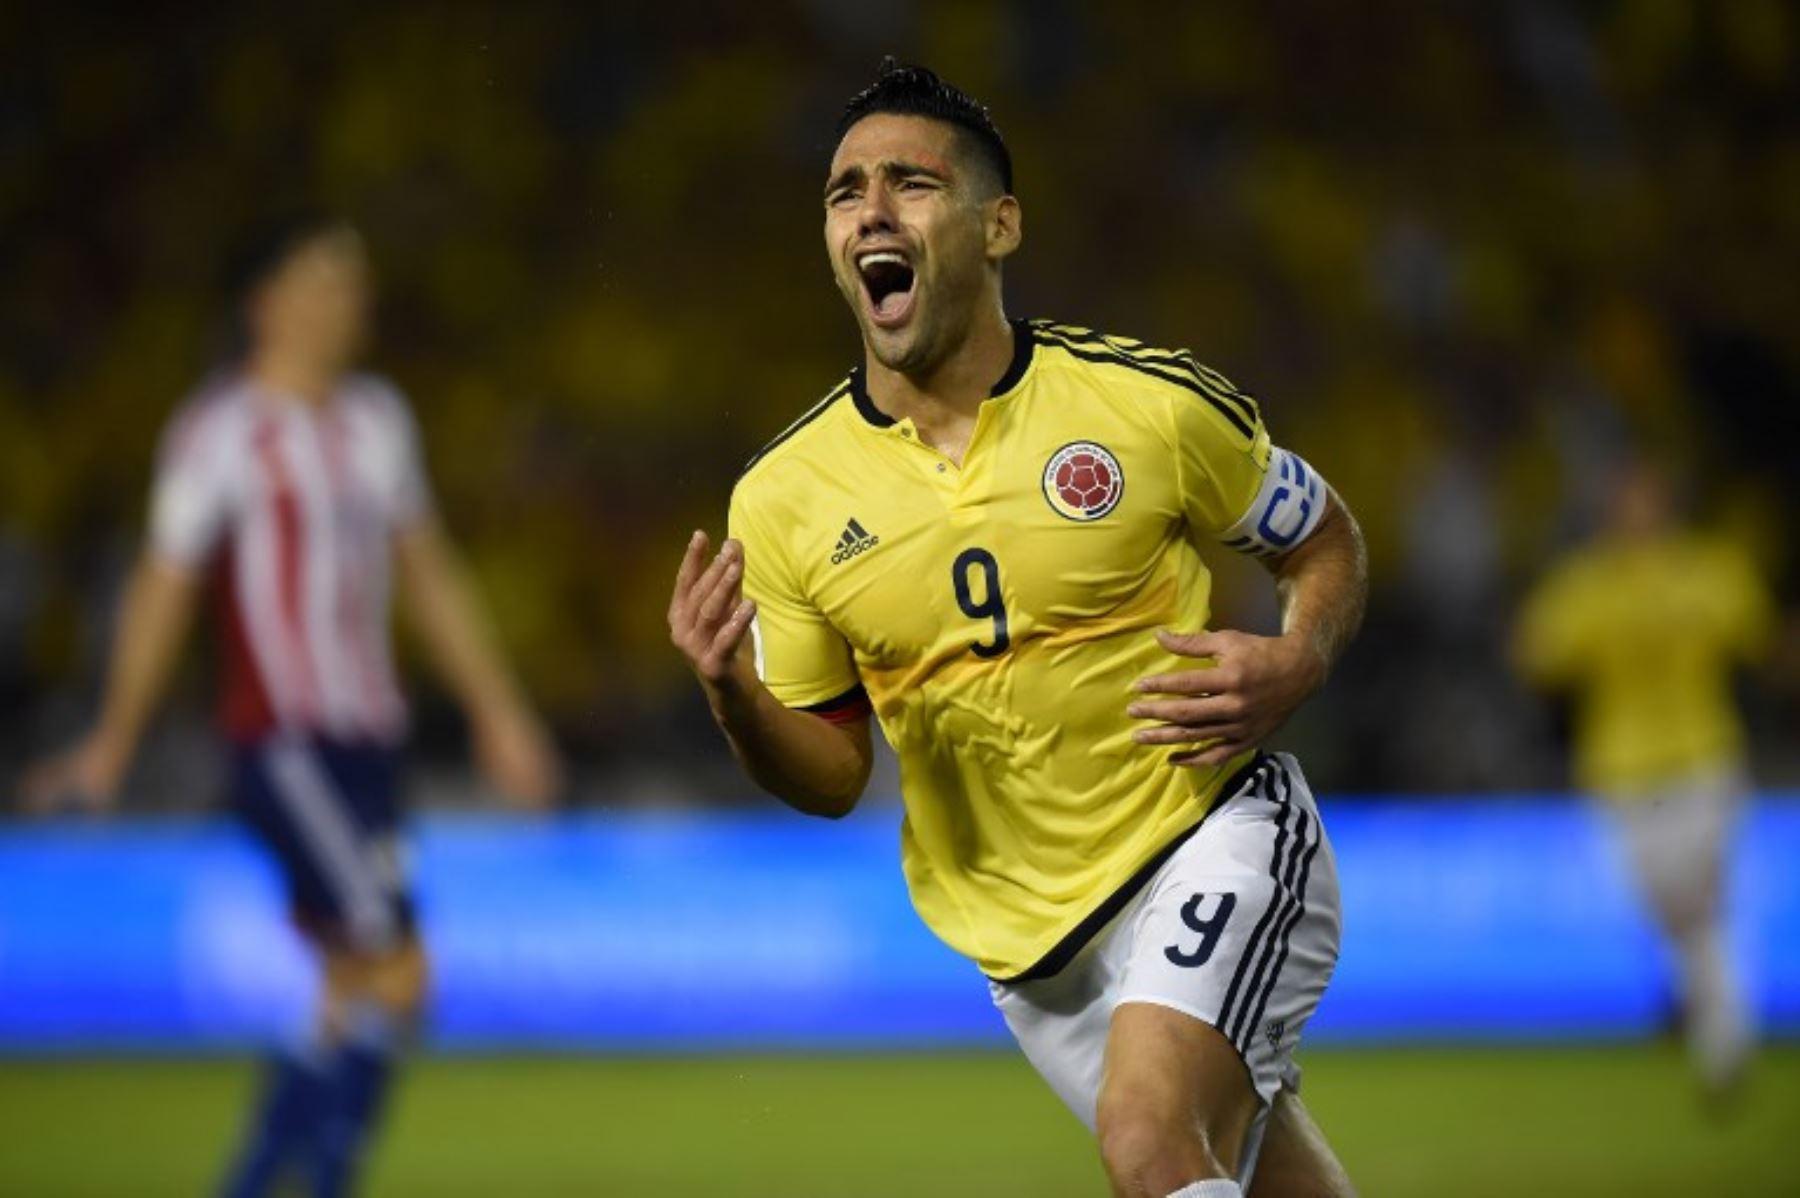 Selección de Colombia llega esta tarde para enfrentar a Perú